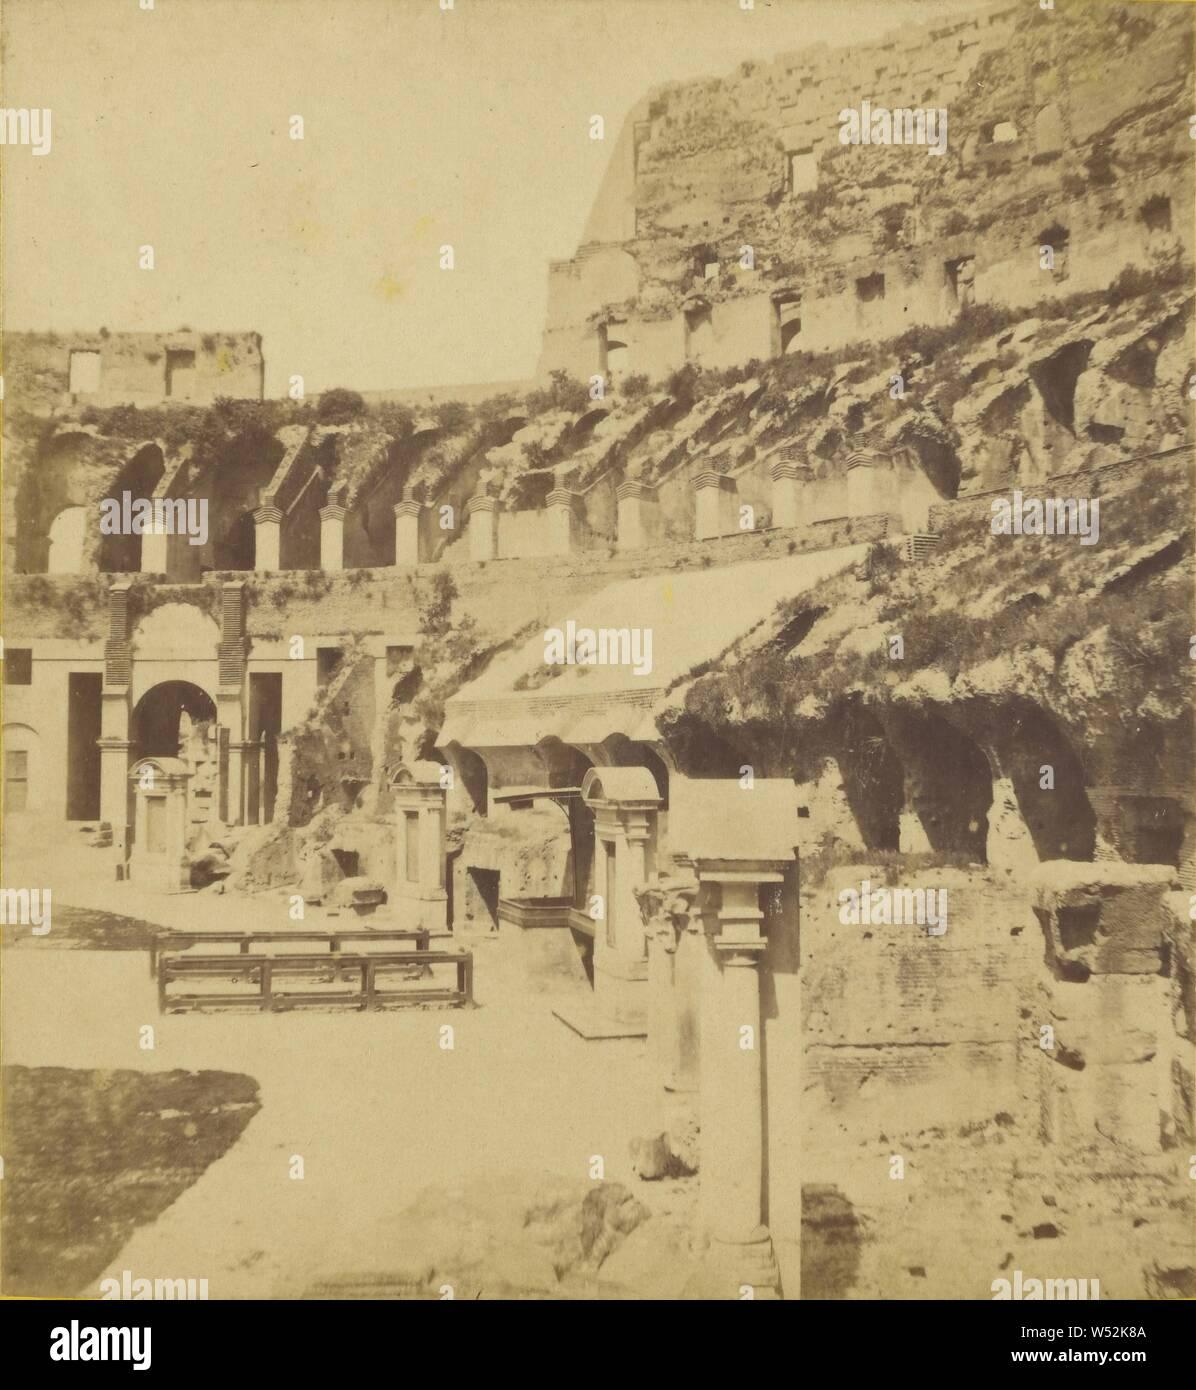 Interieur du Colisee (Roma), fabricante desconocido, Italiano, alrededor de 1870, albúmina imprimir plata Foto de stock